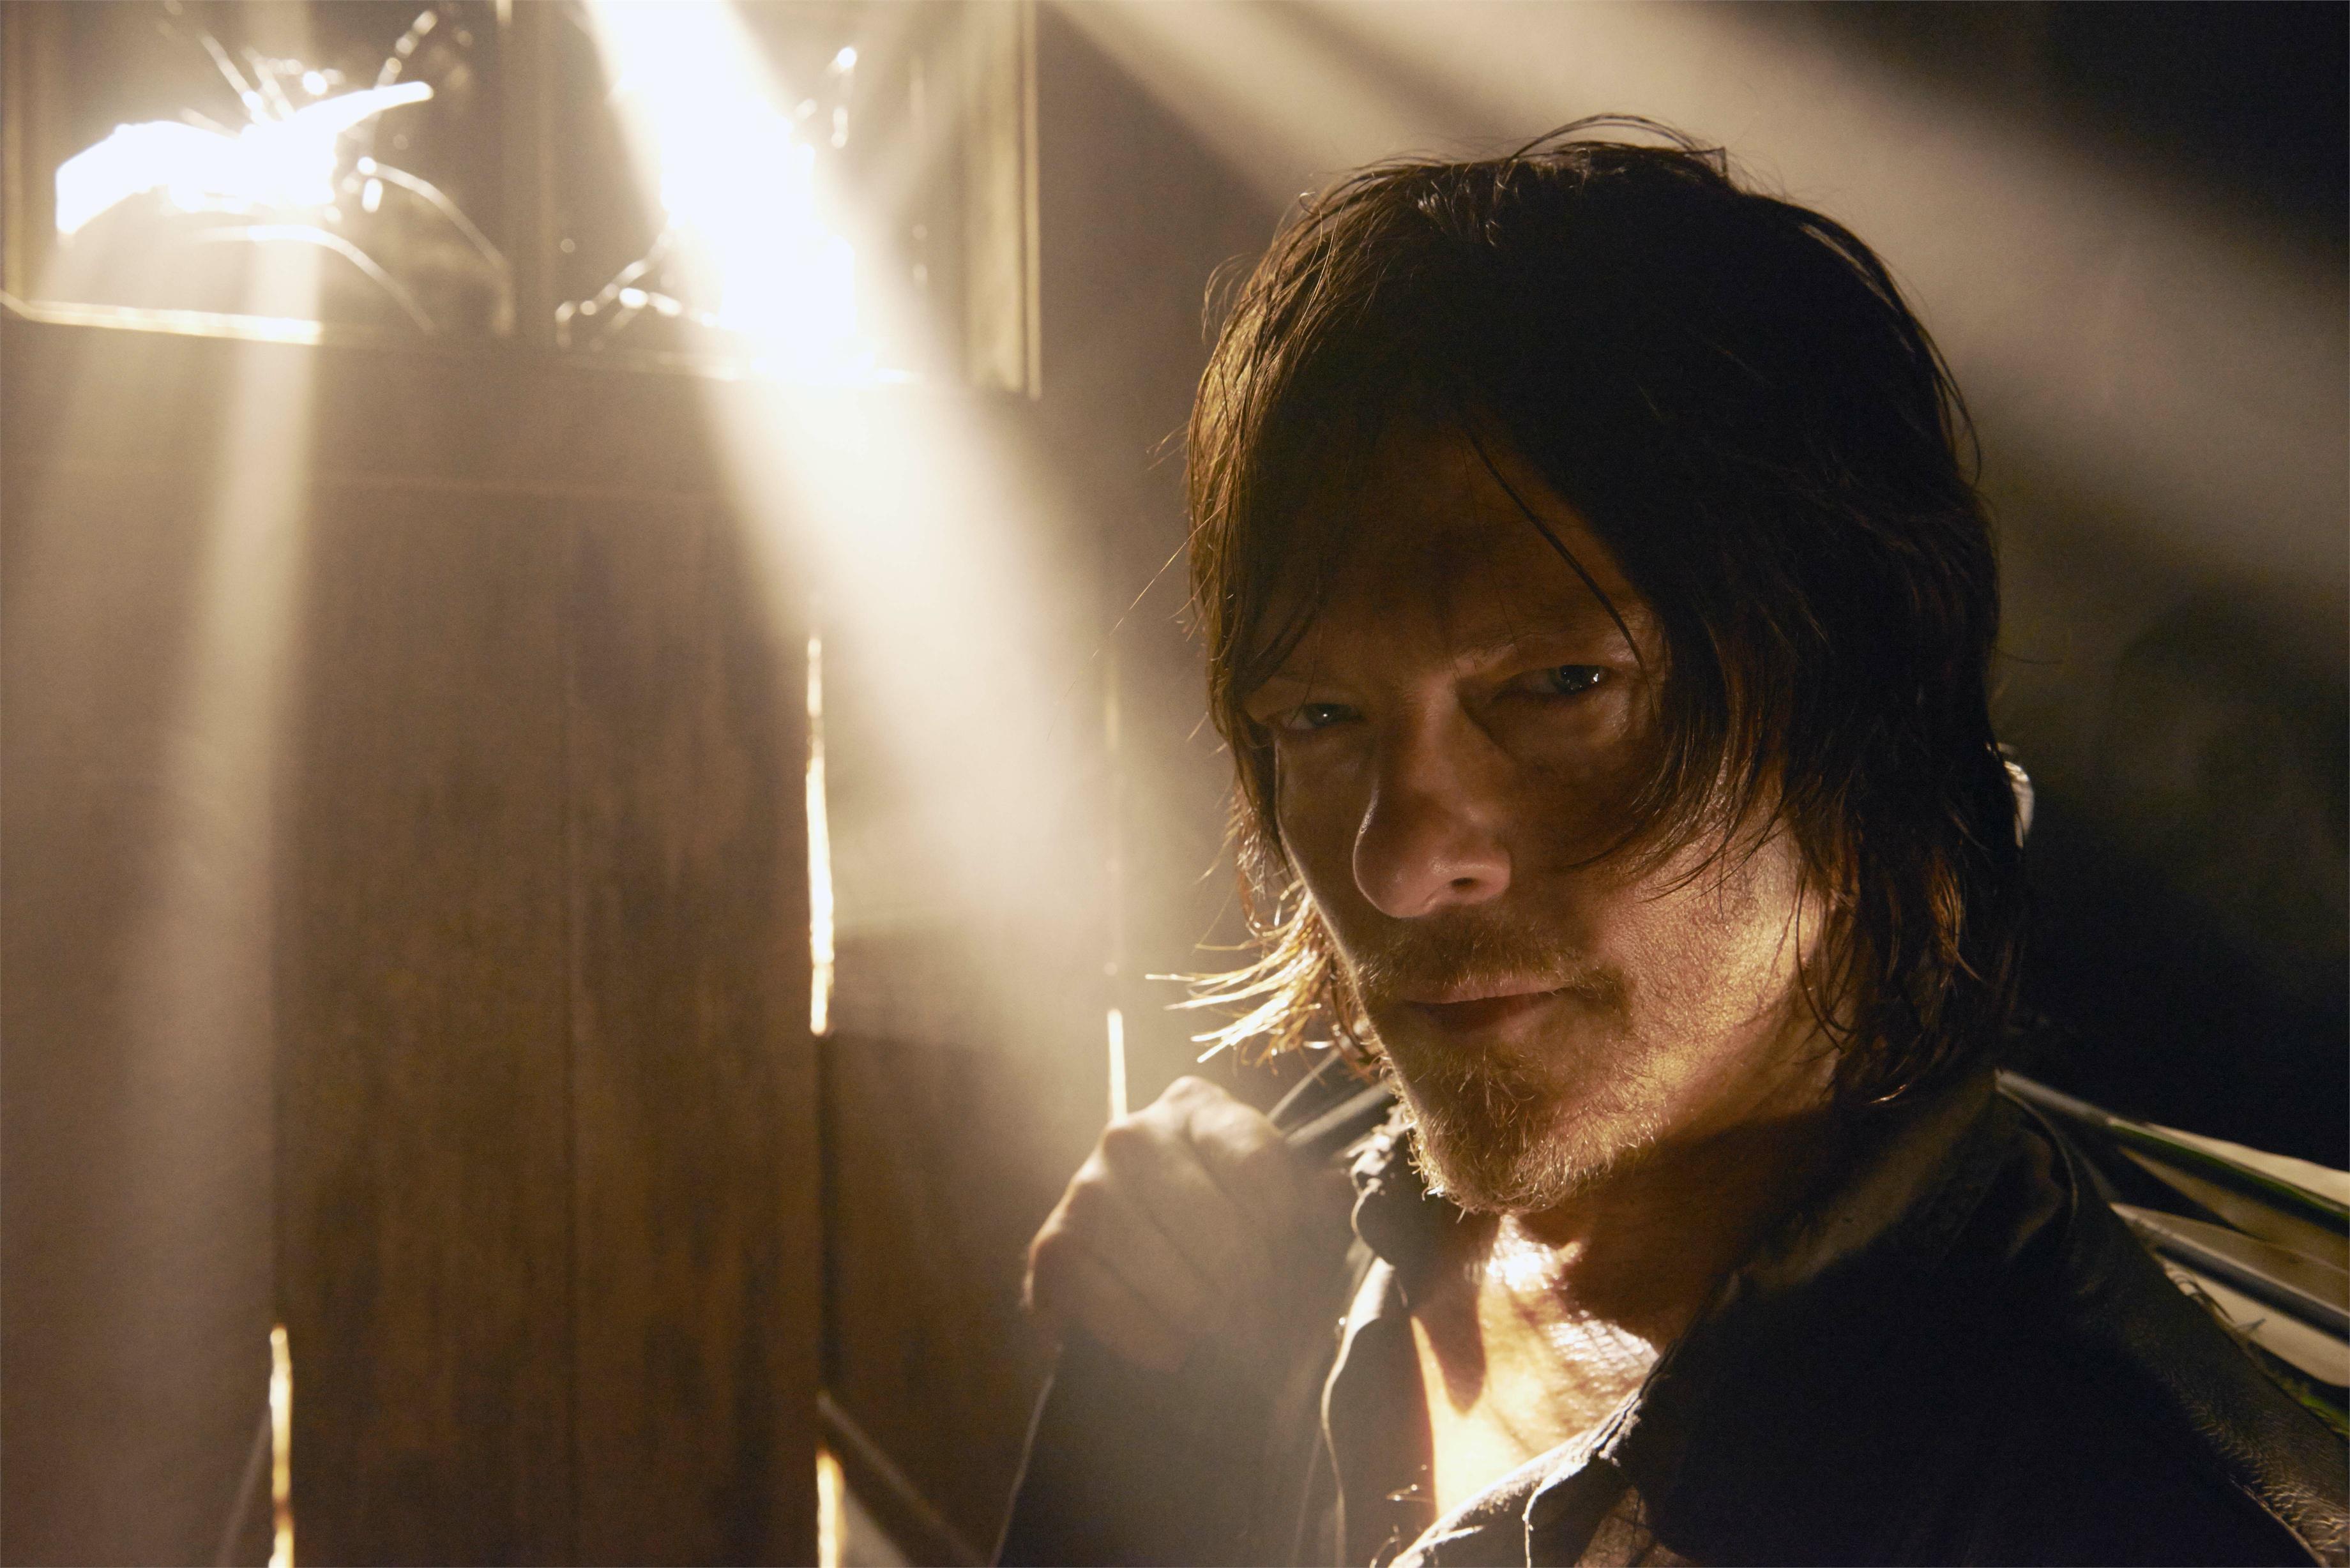 Daryl-Dixon-The-Walking-Dead-5-Temporada-Personagens-HQ-016